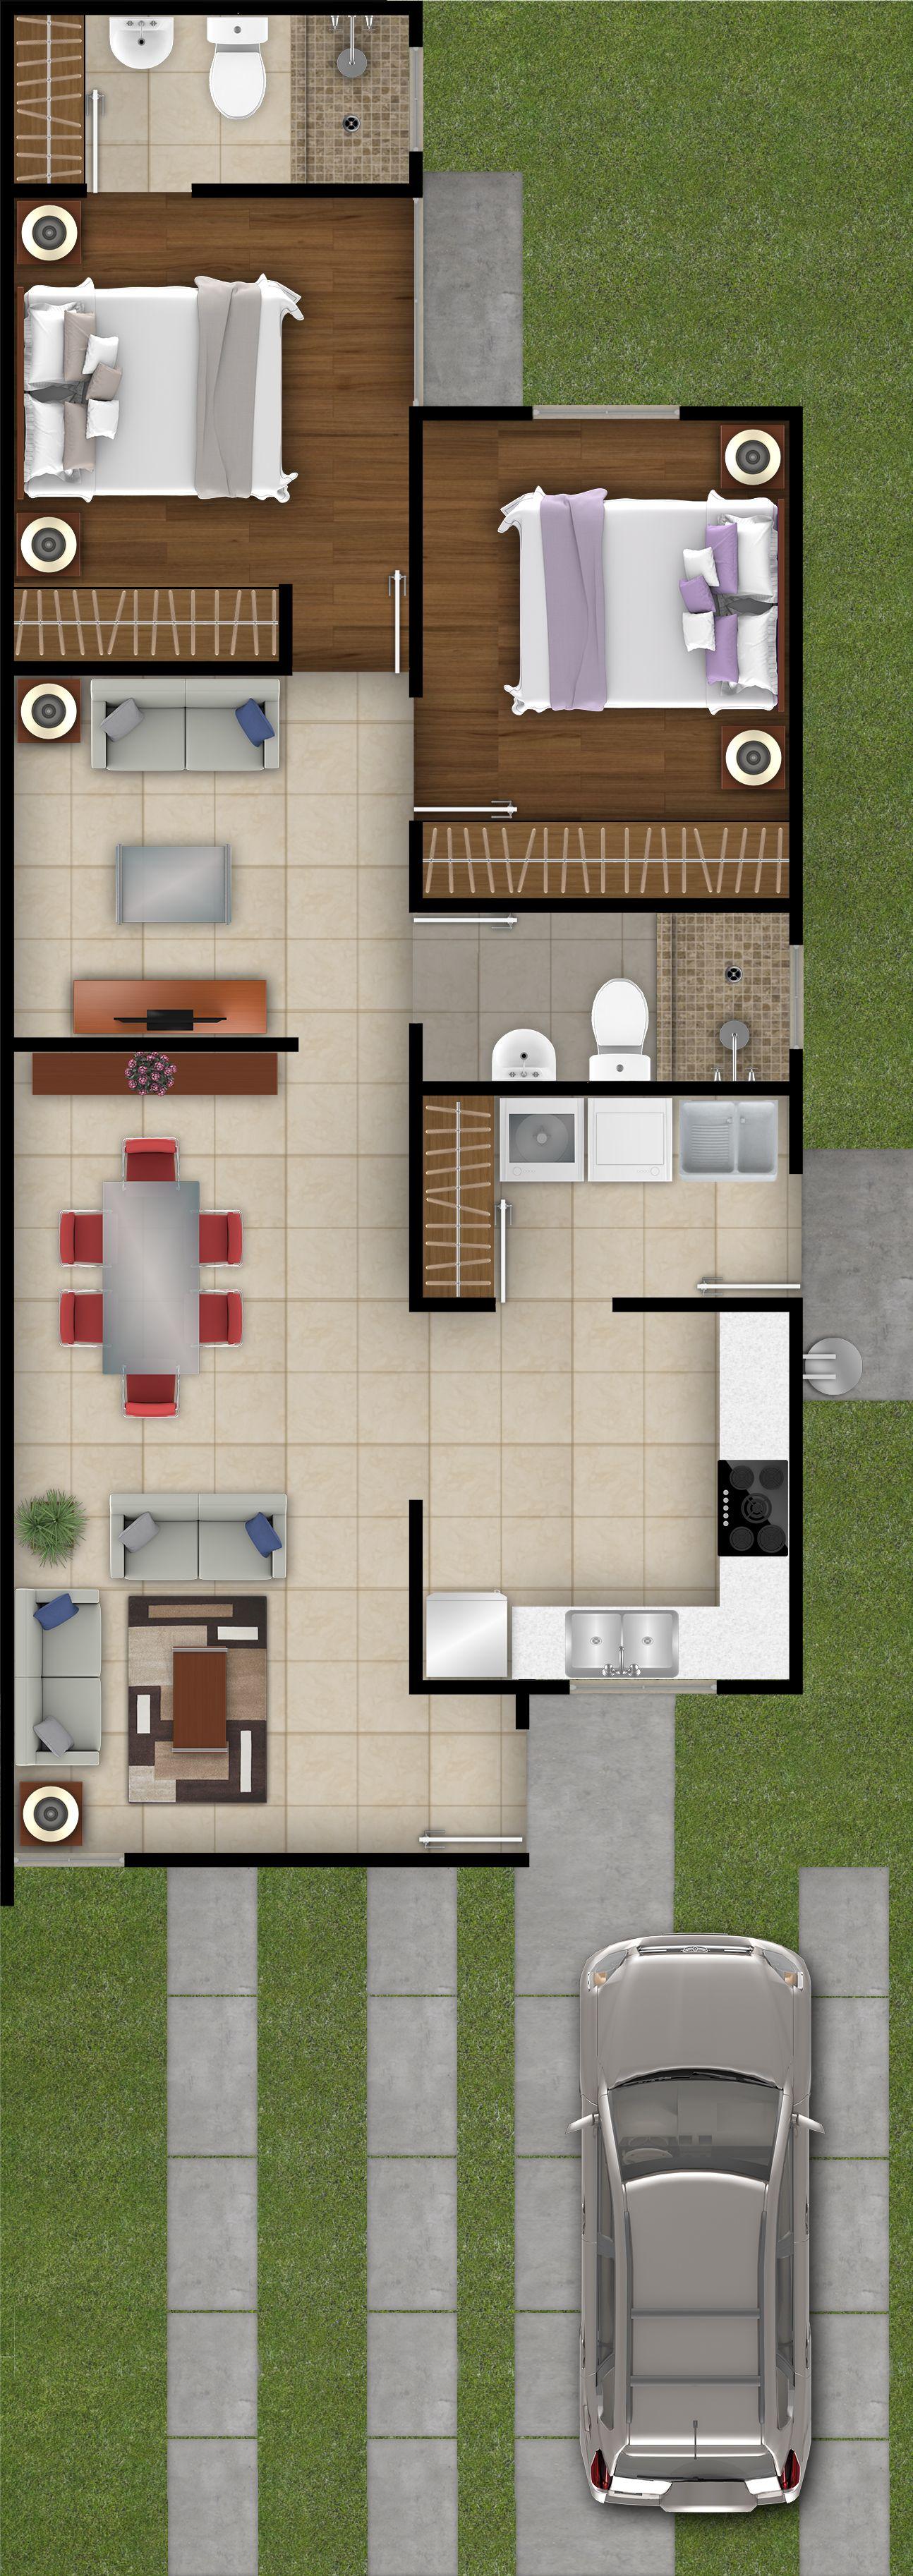 100 Americas Best Floor Plans Beauteous 20 Luxury